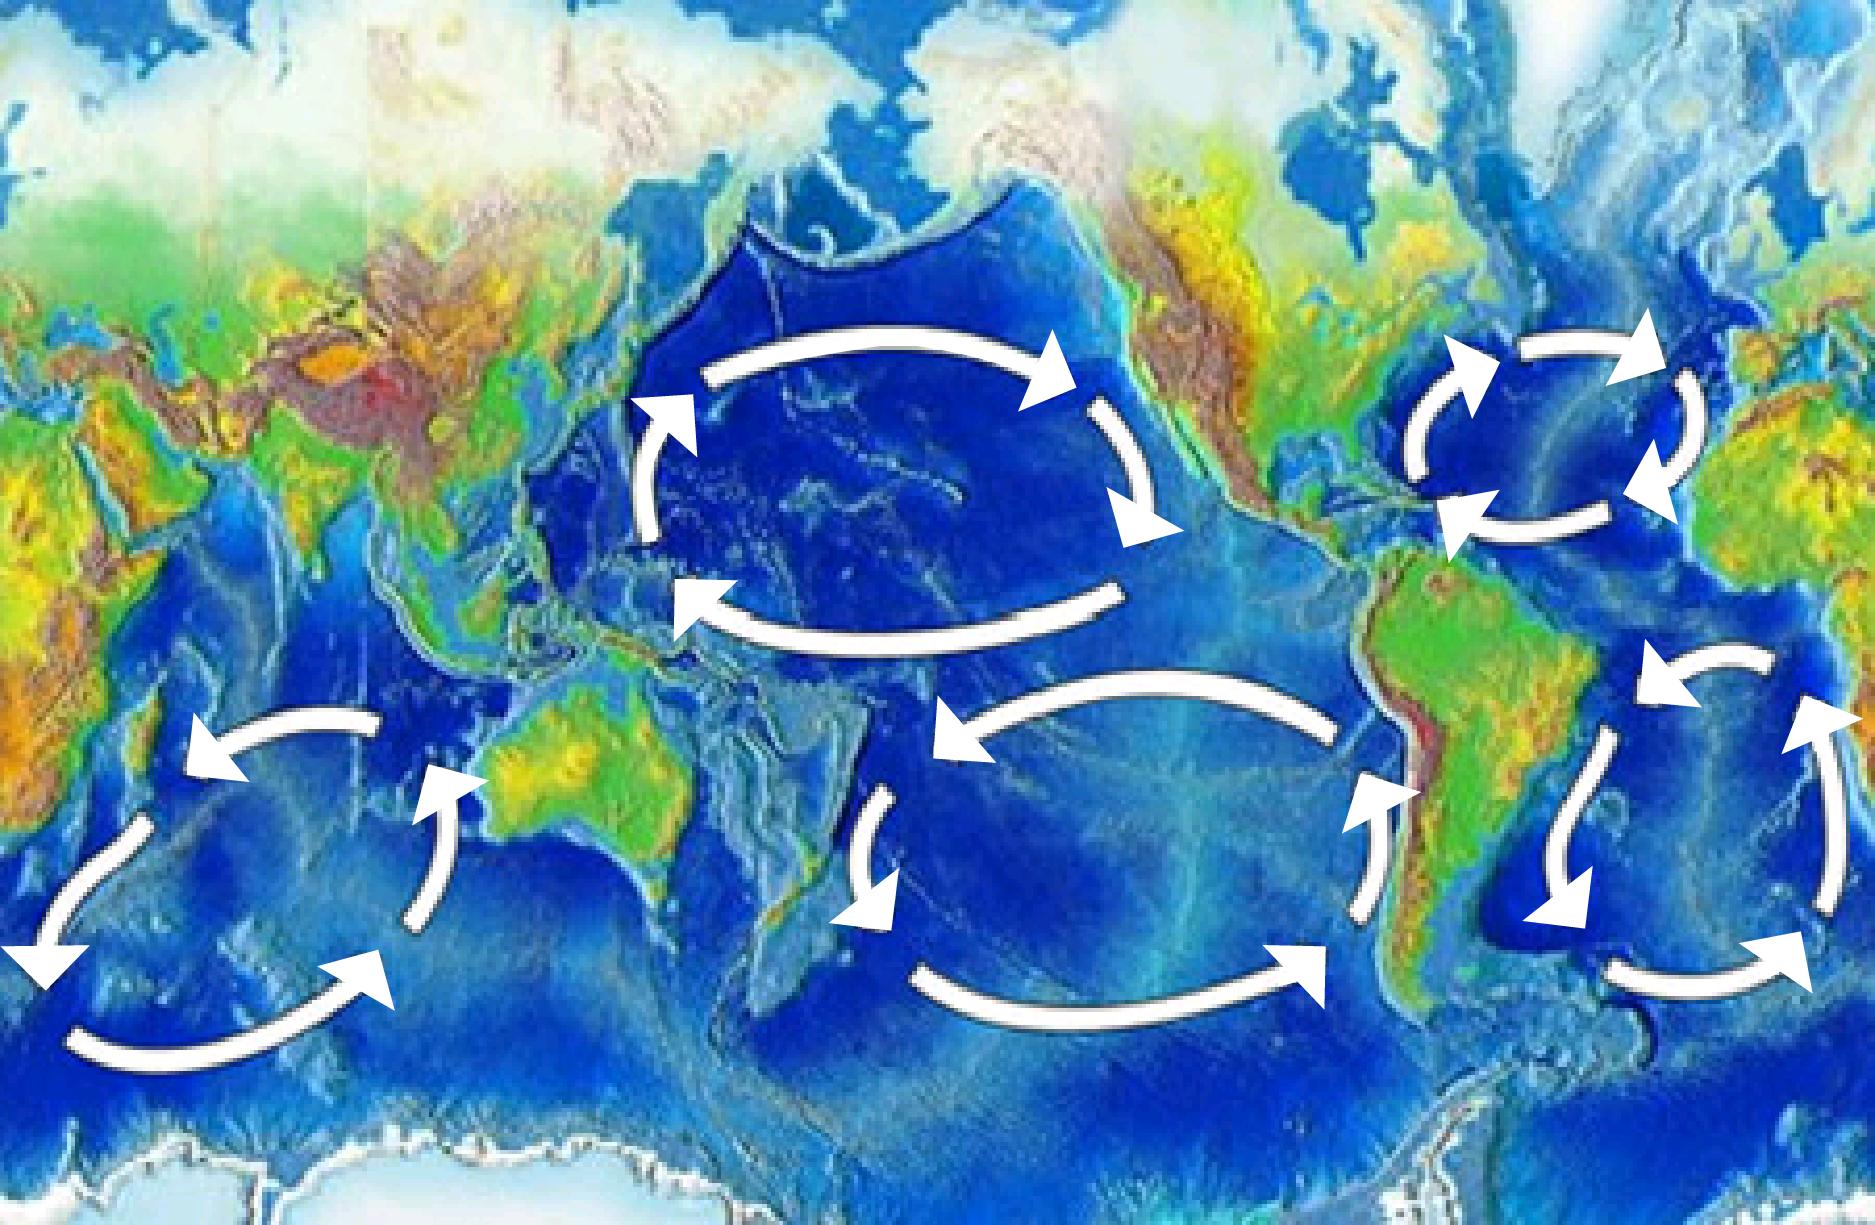 5 major plastic waste gyres in the world oceans